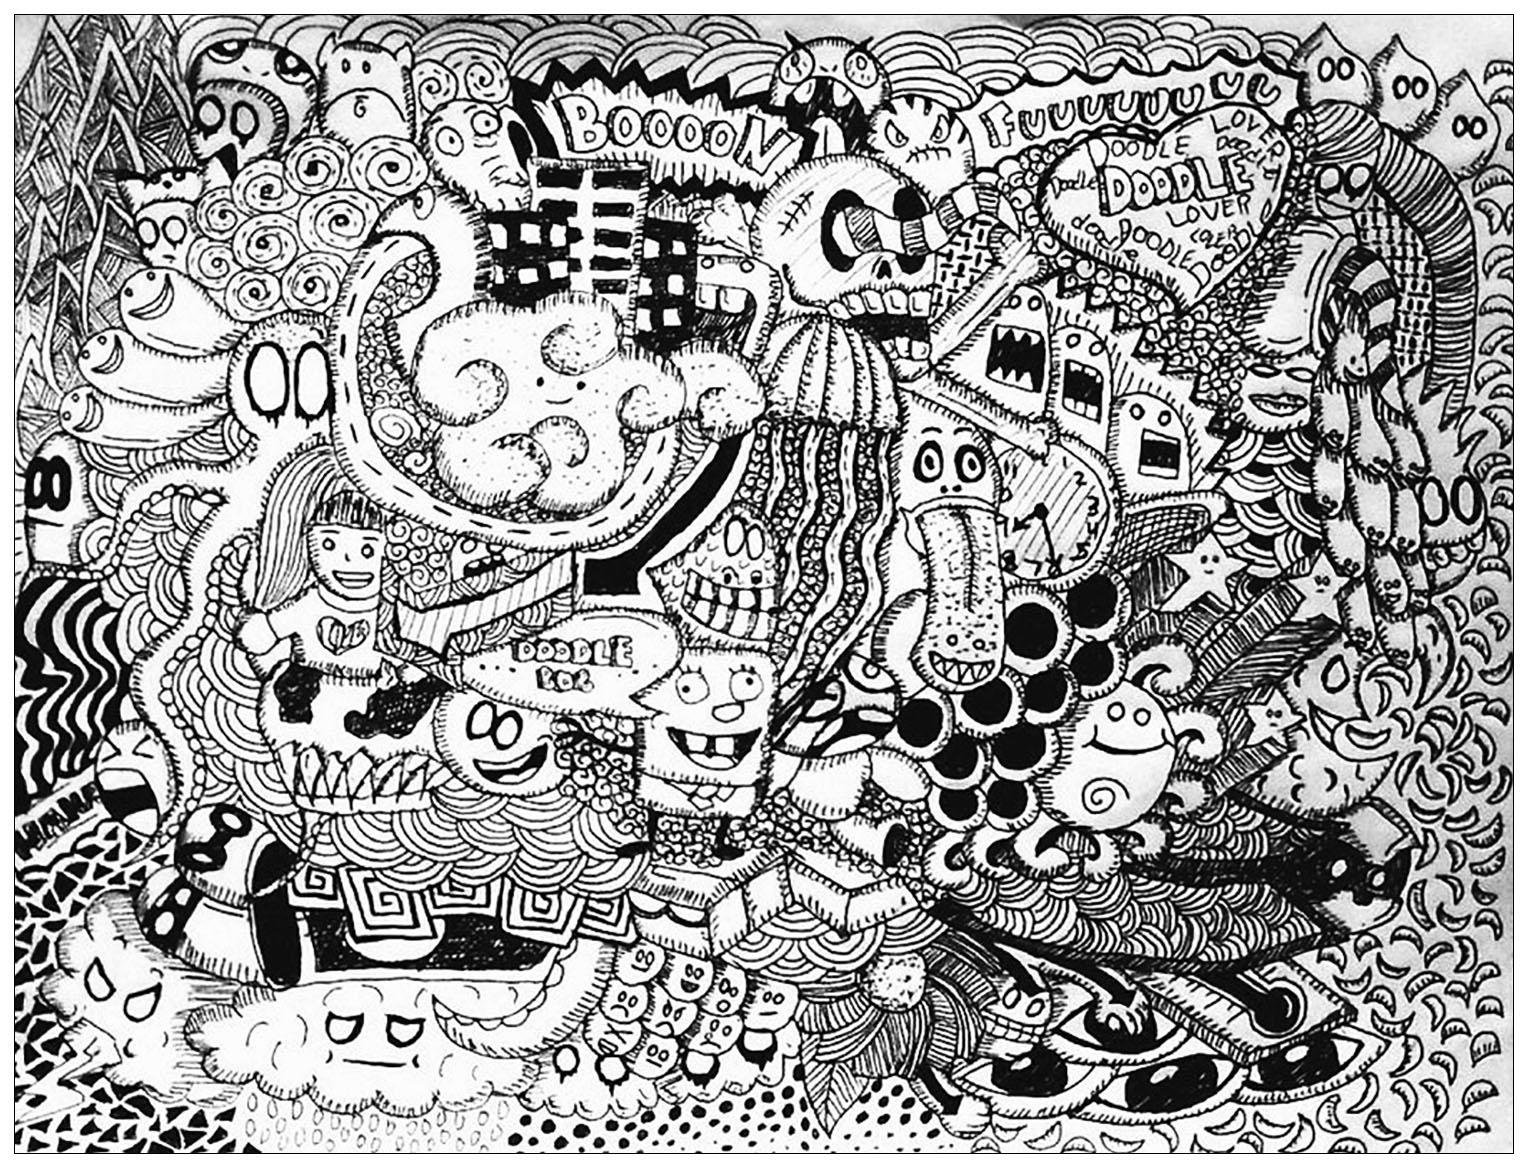 Doodle lover.